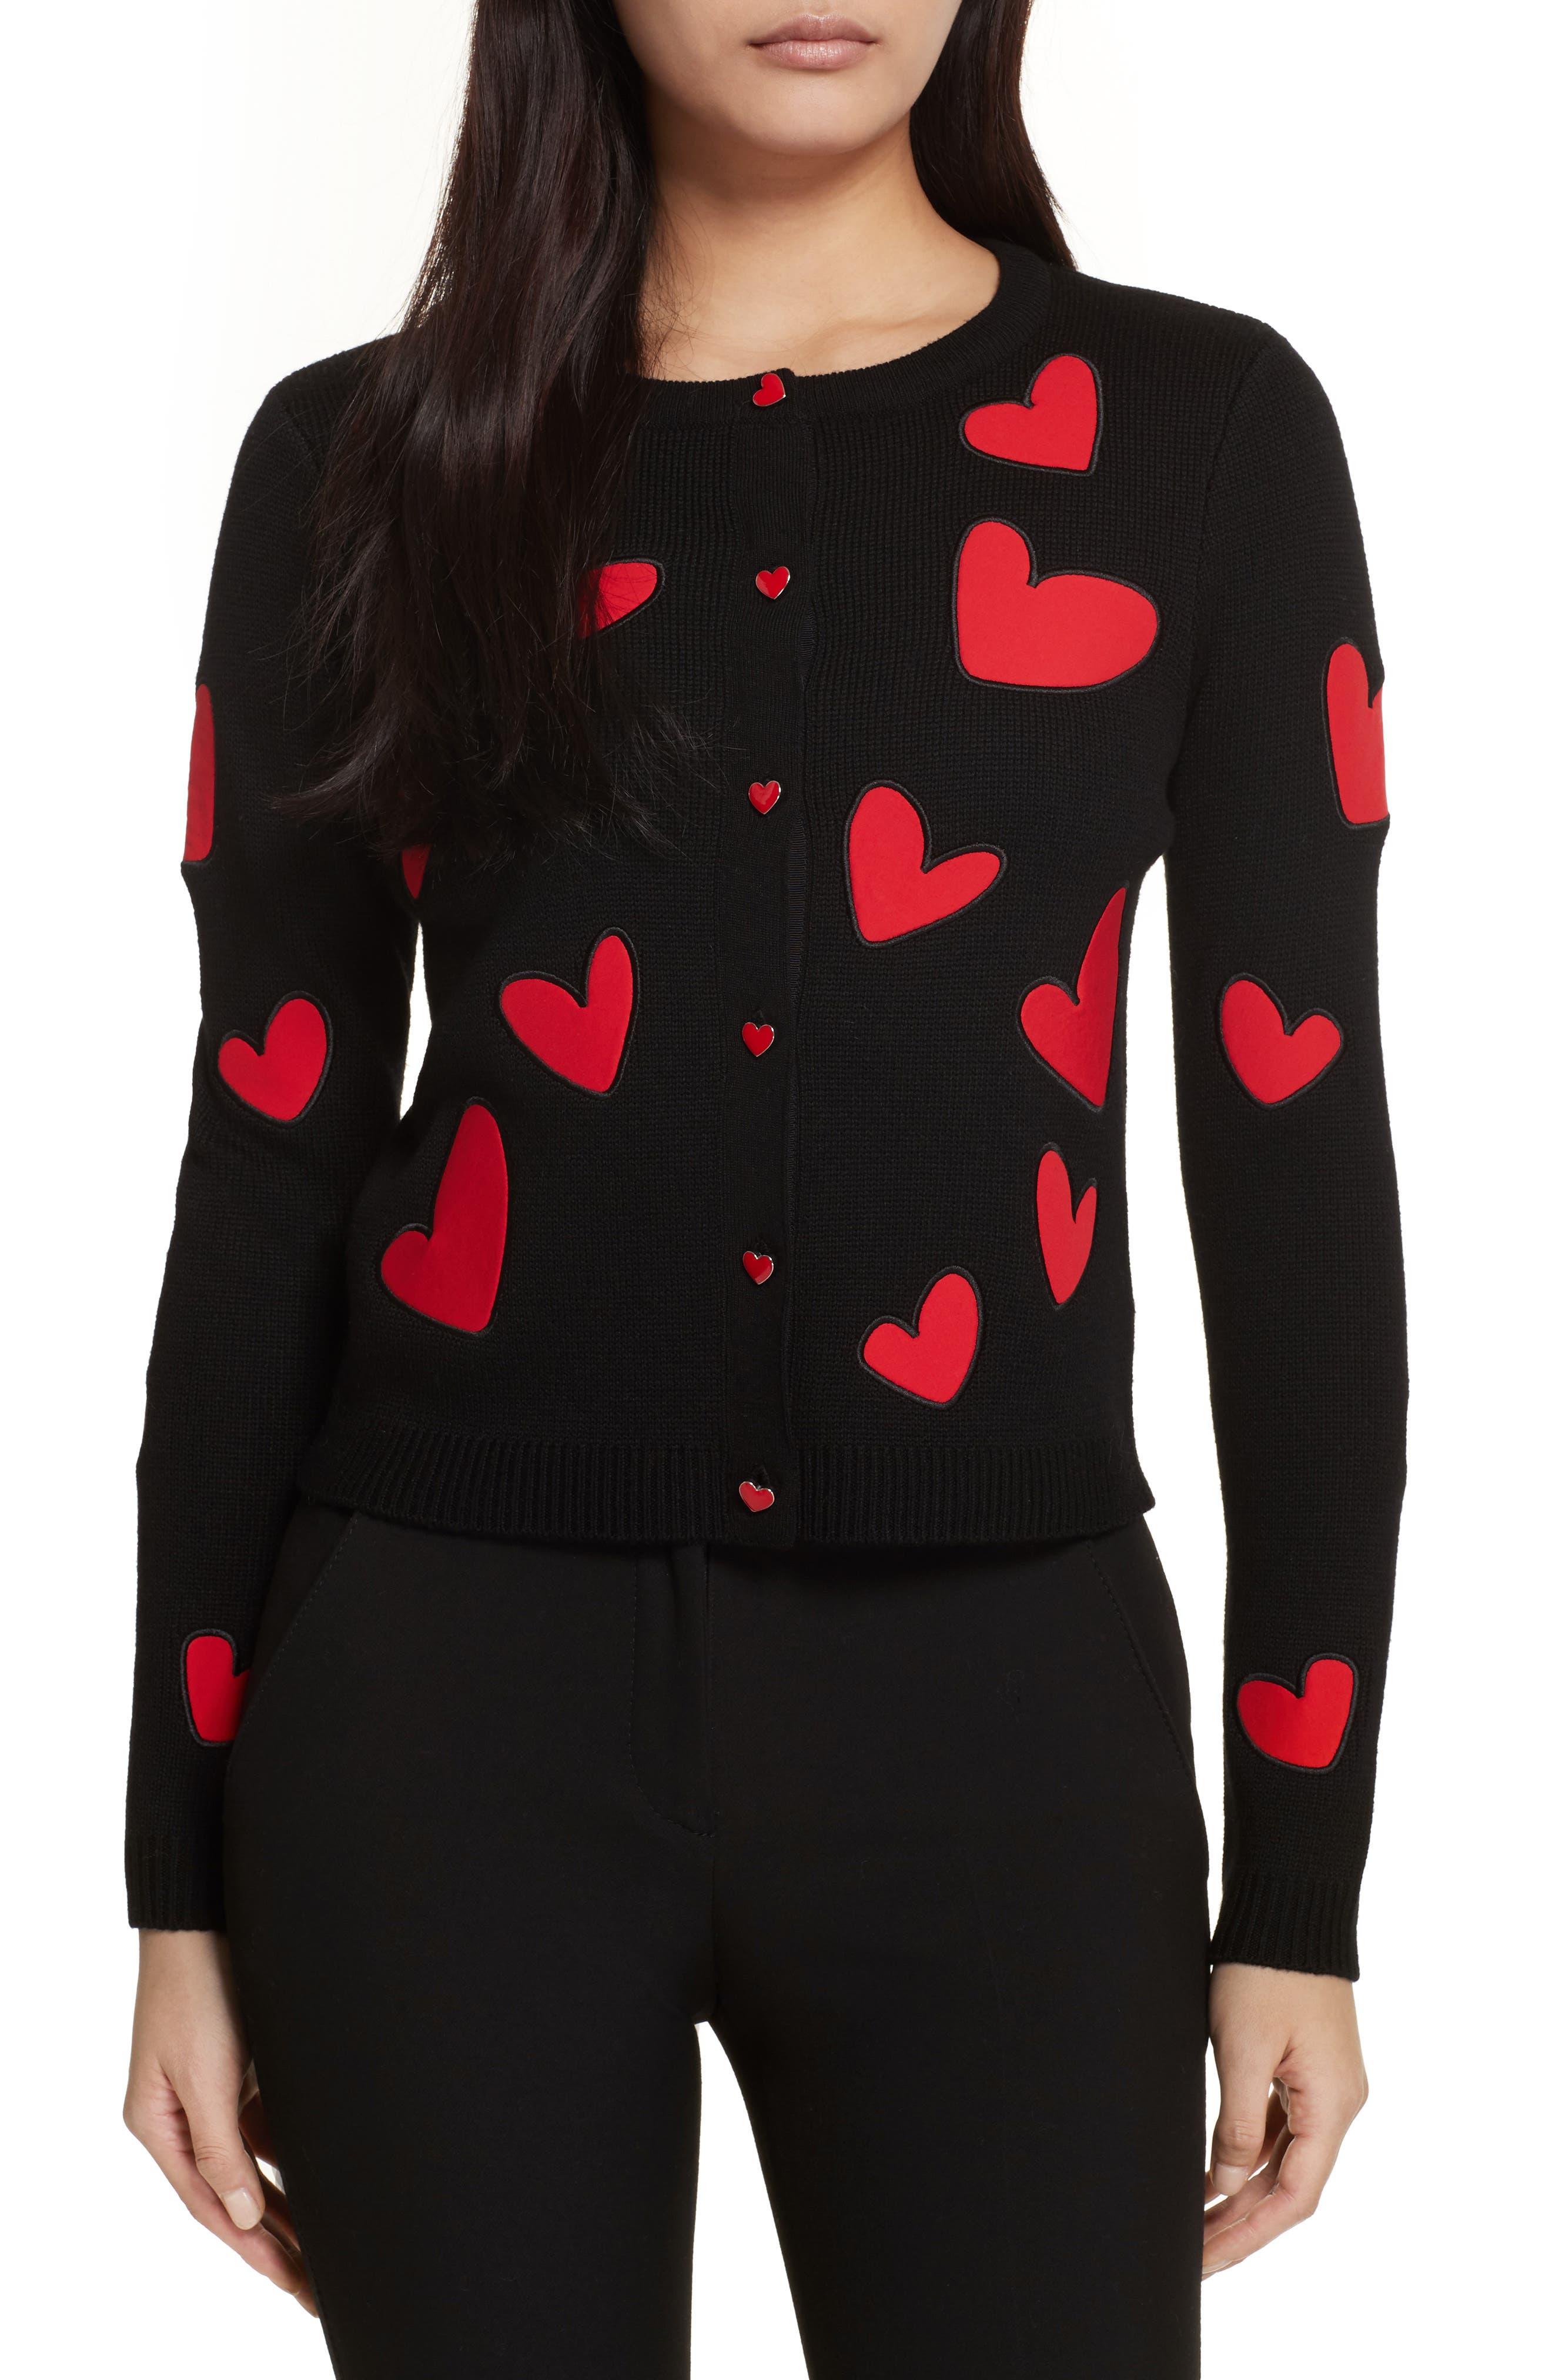 Ruthy Heart Appliqué Cardigan,                         Main,                         color, Black/ Apple